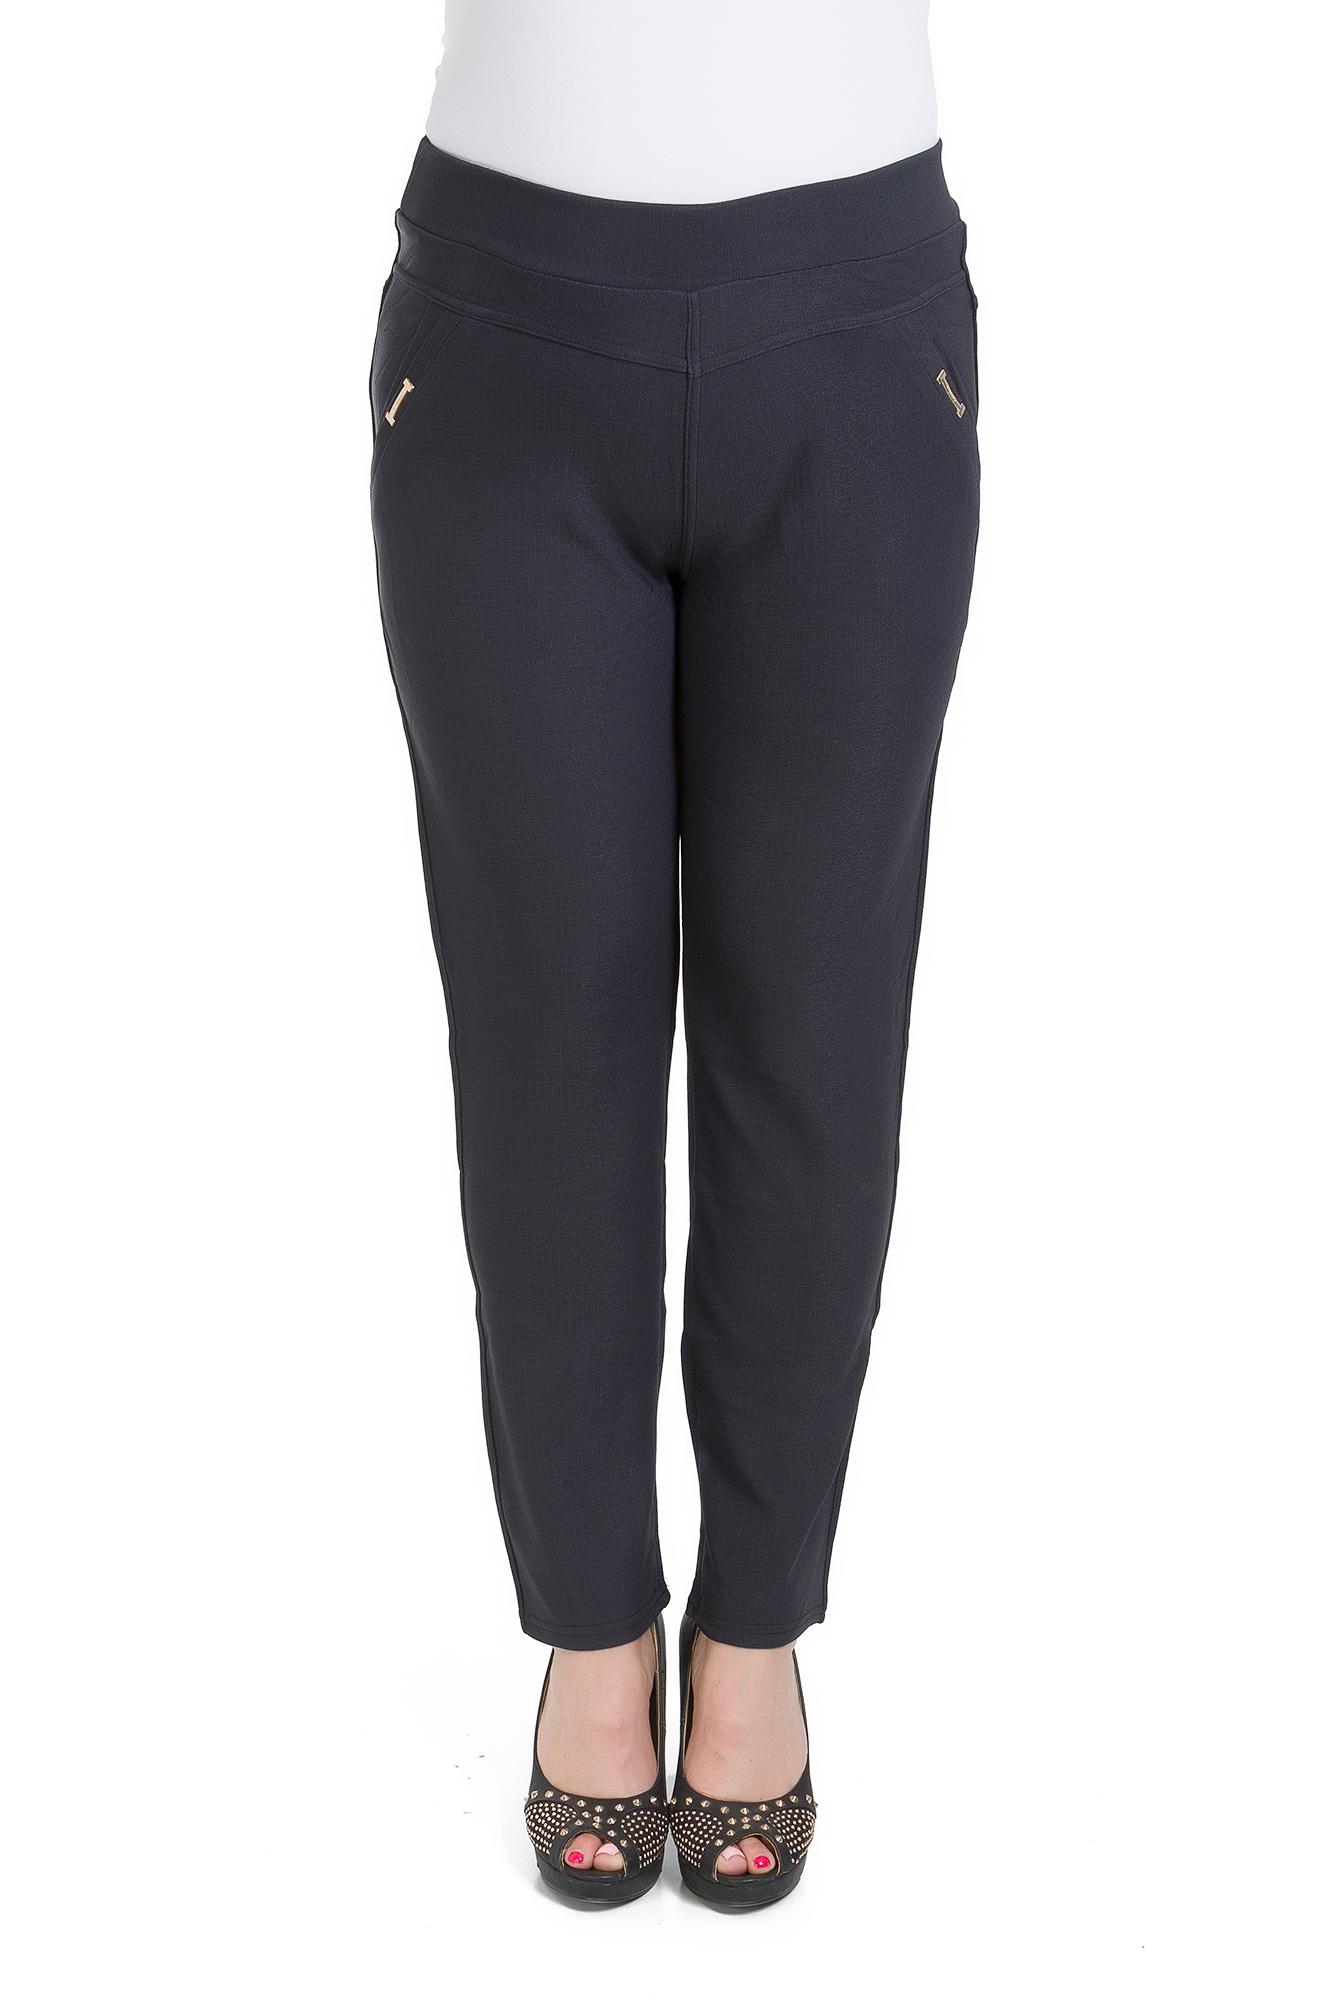 Womens High Waisted Stretch Trousers Pockets Straight Leg Pants 2XL-6XL KZY-W012